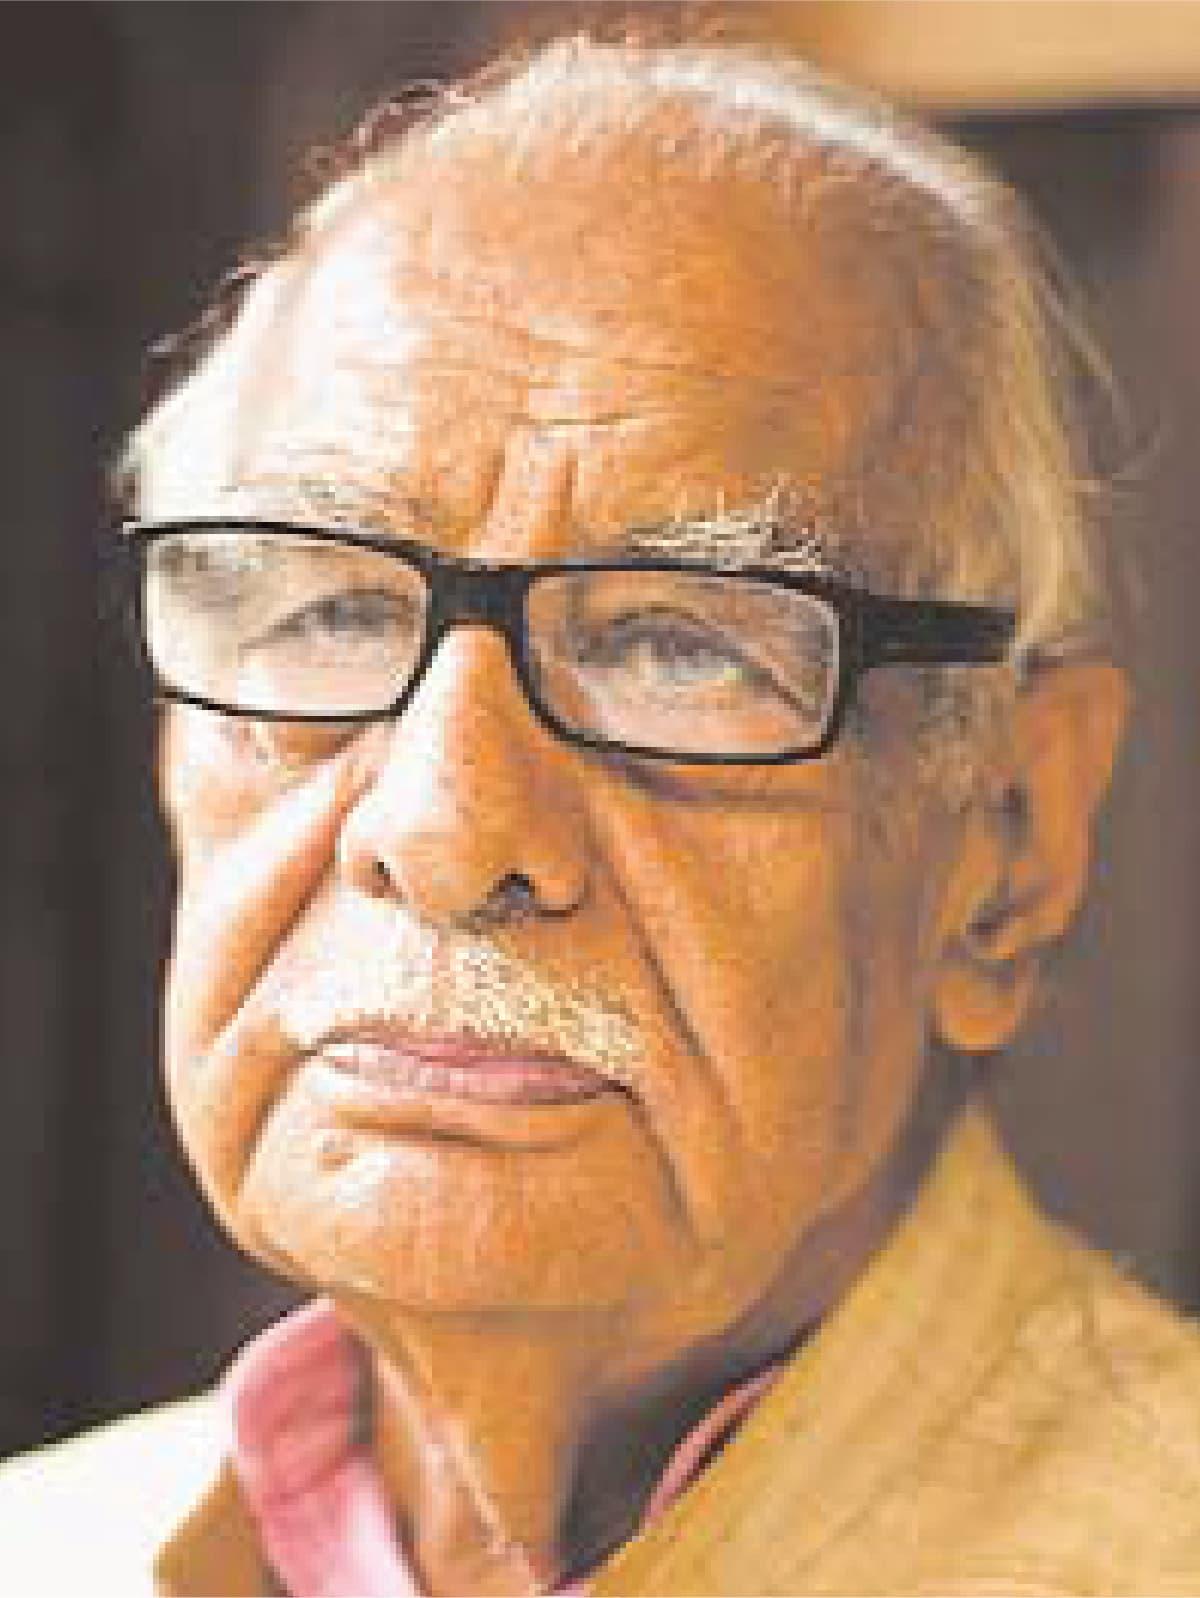 A portrait of Kuldip Nayar | Herald archives